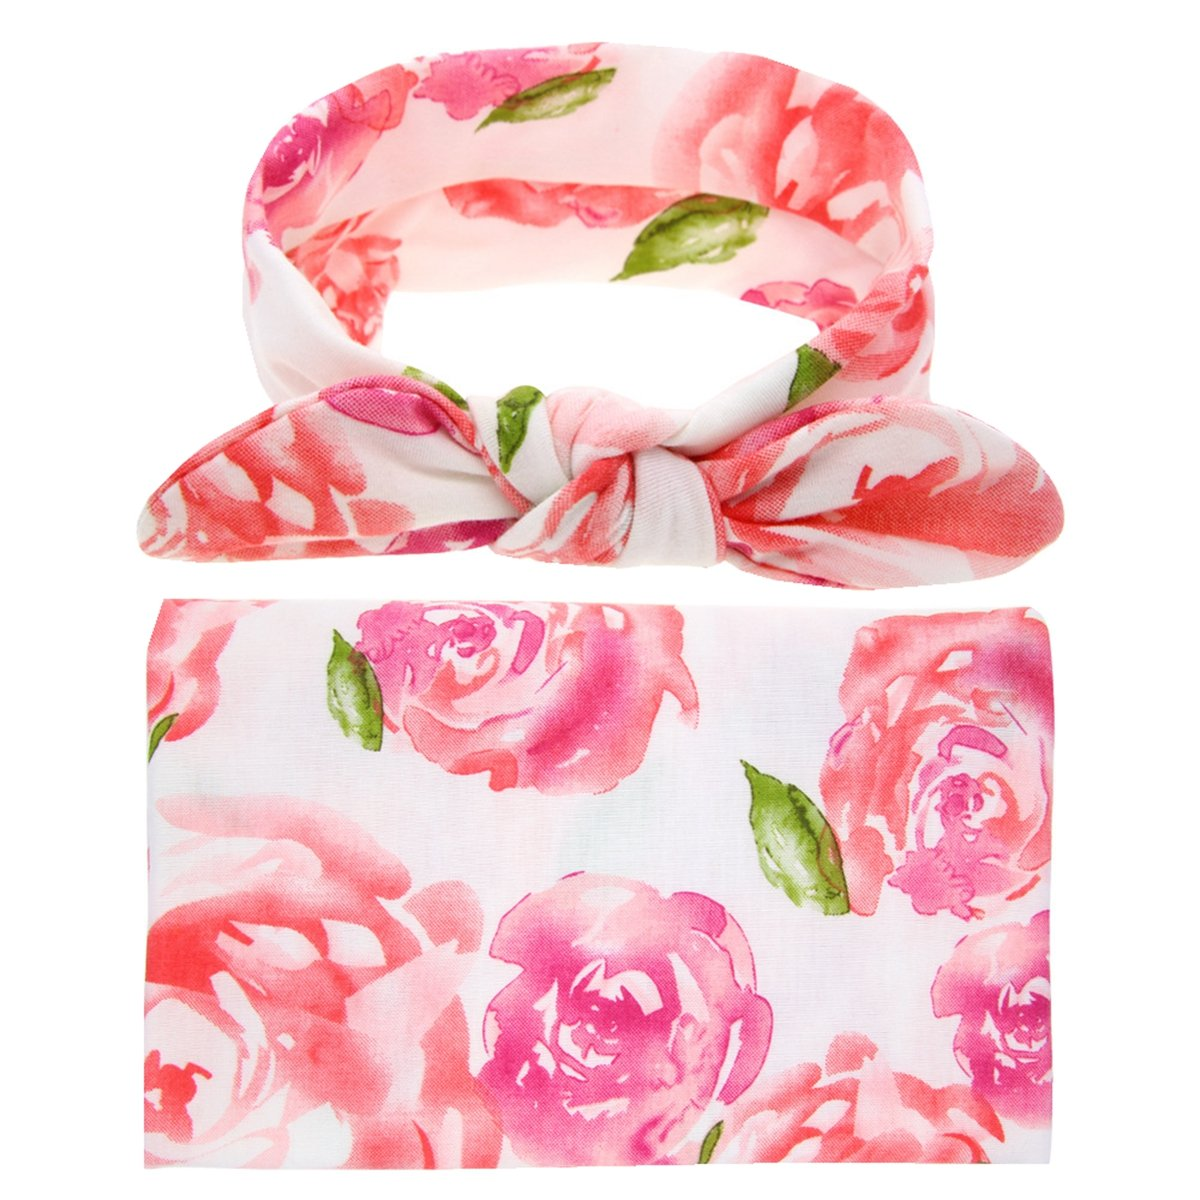 Newborn Swaddle Blanket Headband Beauty Flower Set Baby Receiving Blankets 2 Pcs Czofnjesi